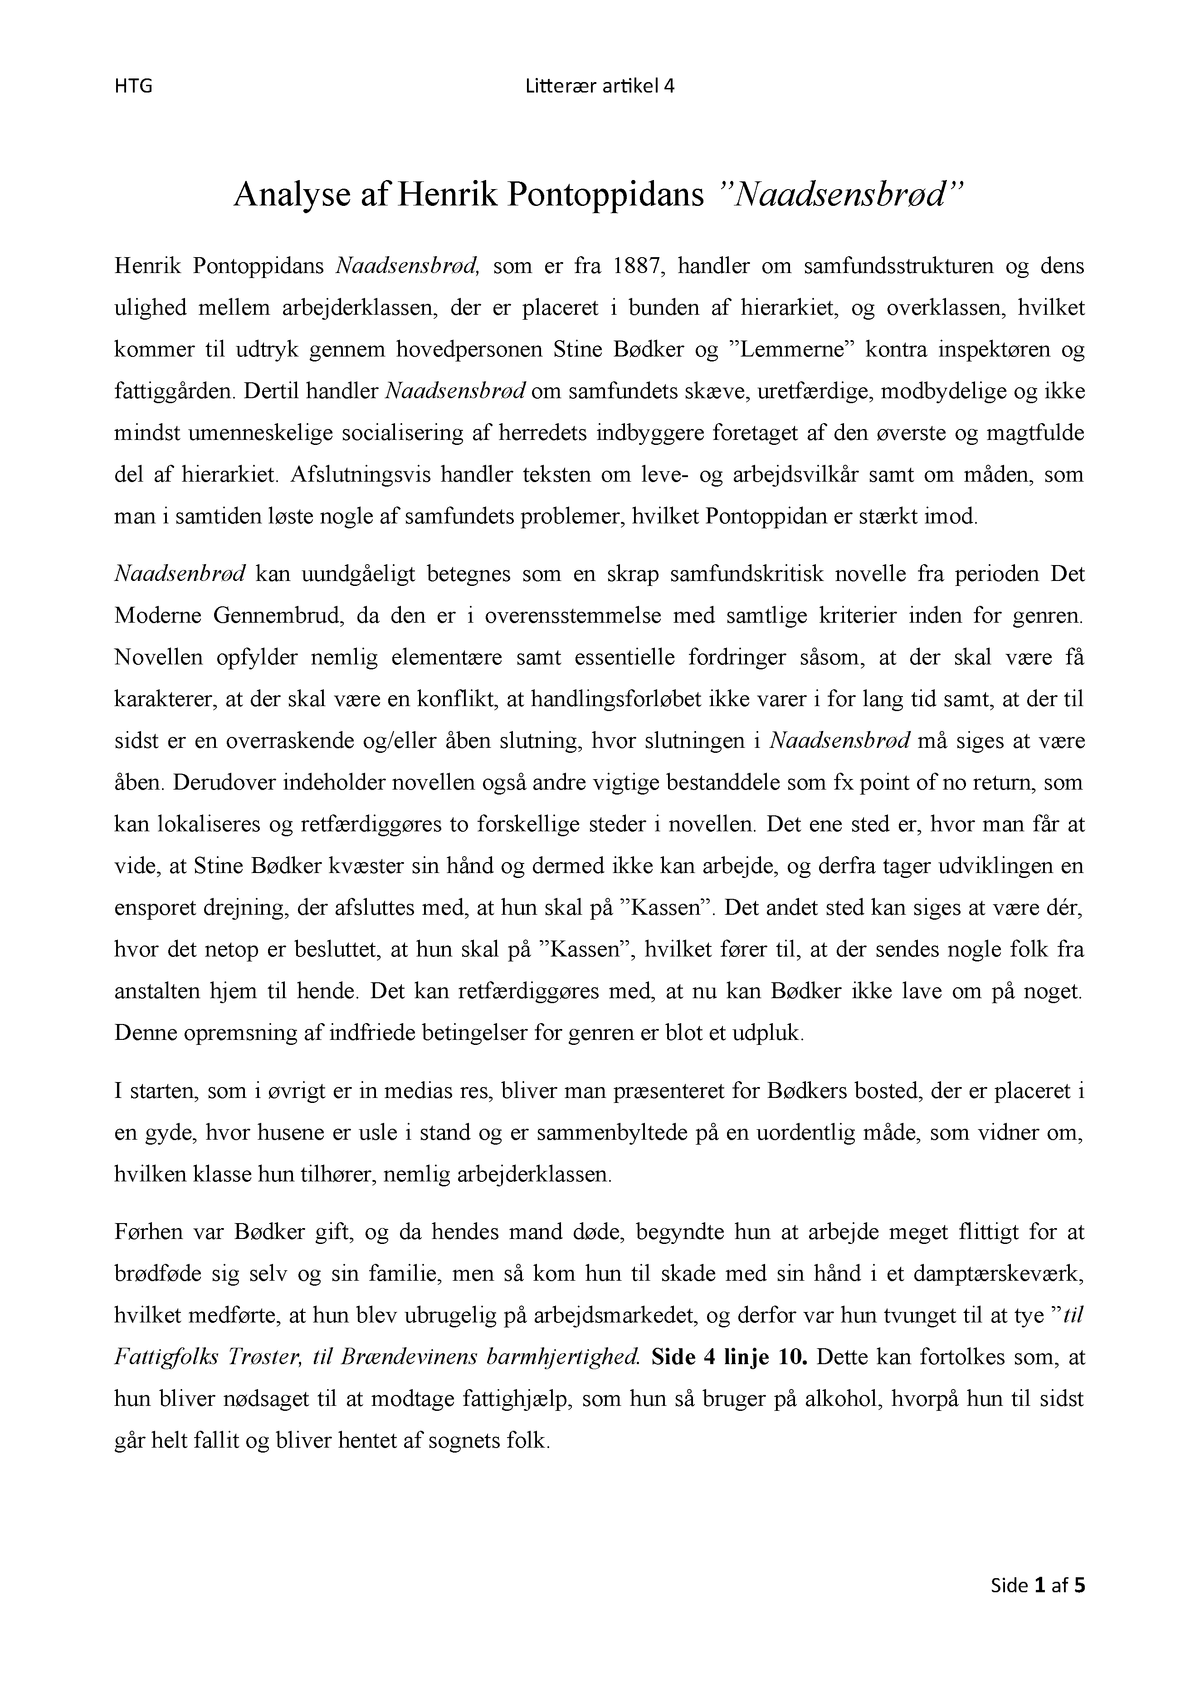 hvordan laver man en litterær artikel